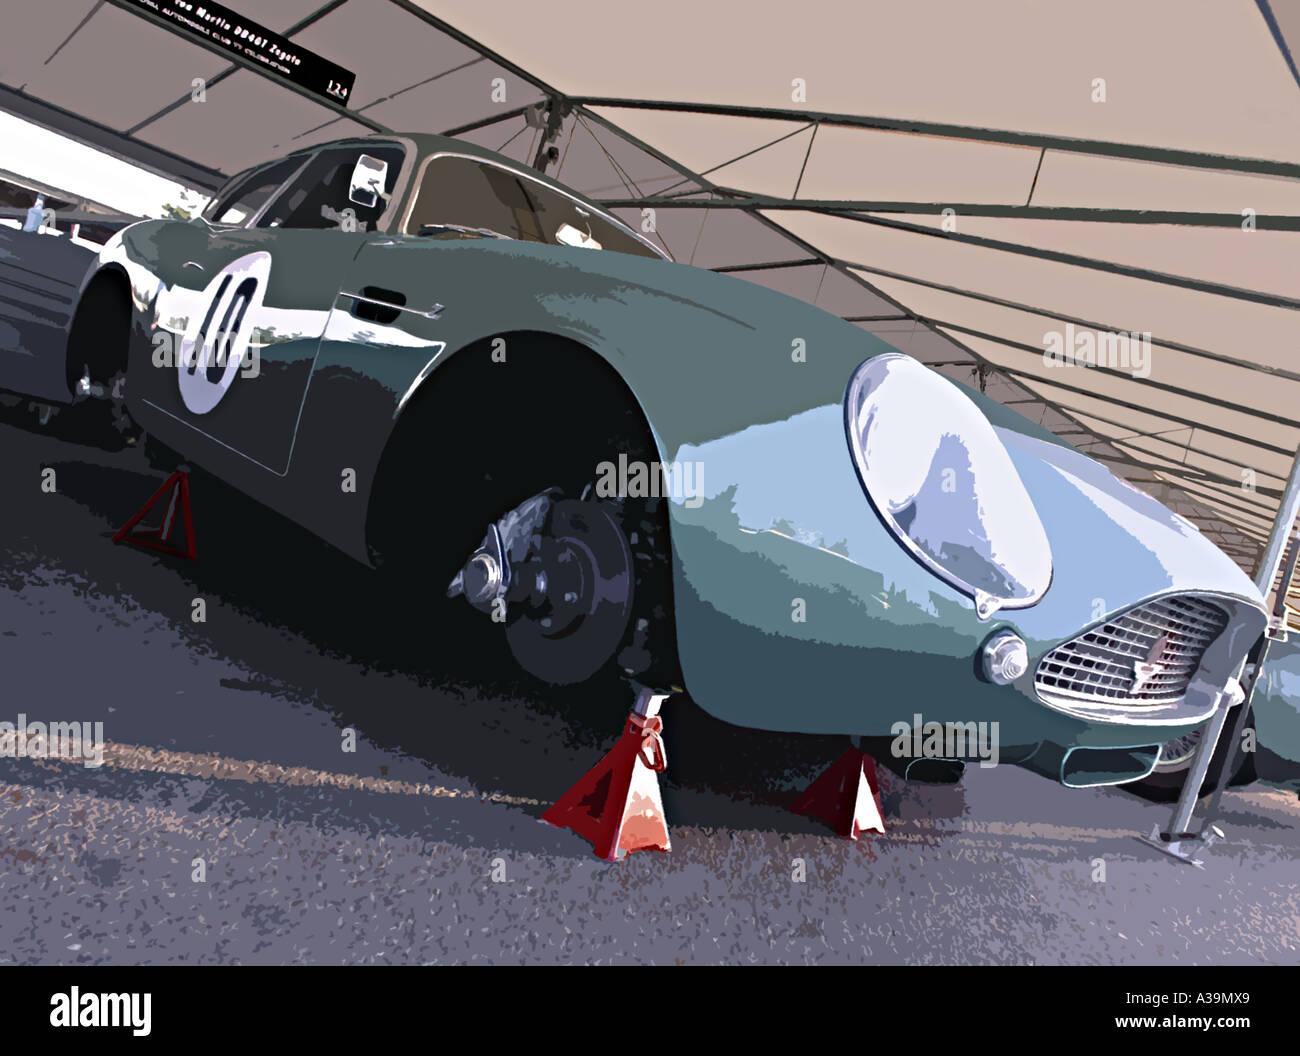 aston martin zagato sports racing car stock photo 6123688 alamy. Black Bedroom Furniture Sets. Home Design Ideas